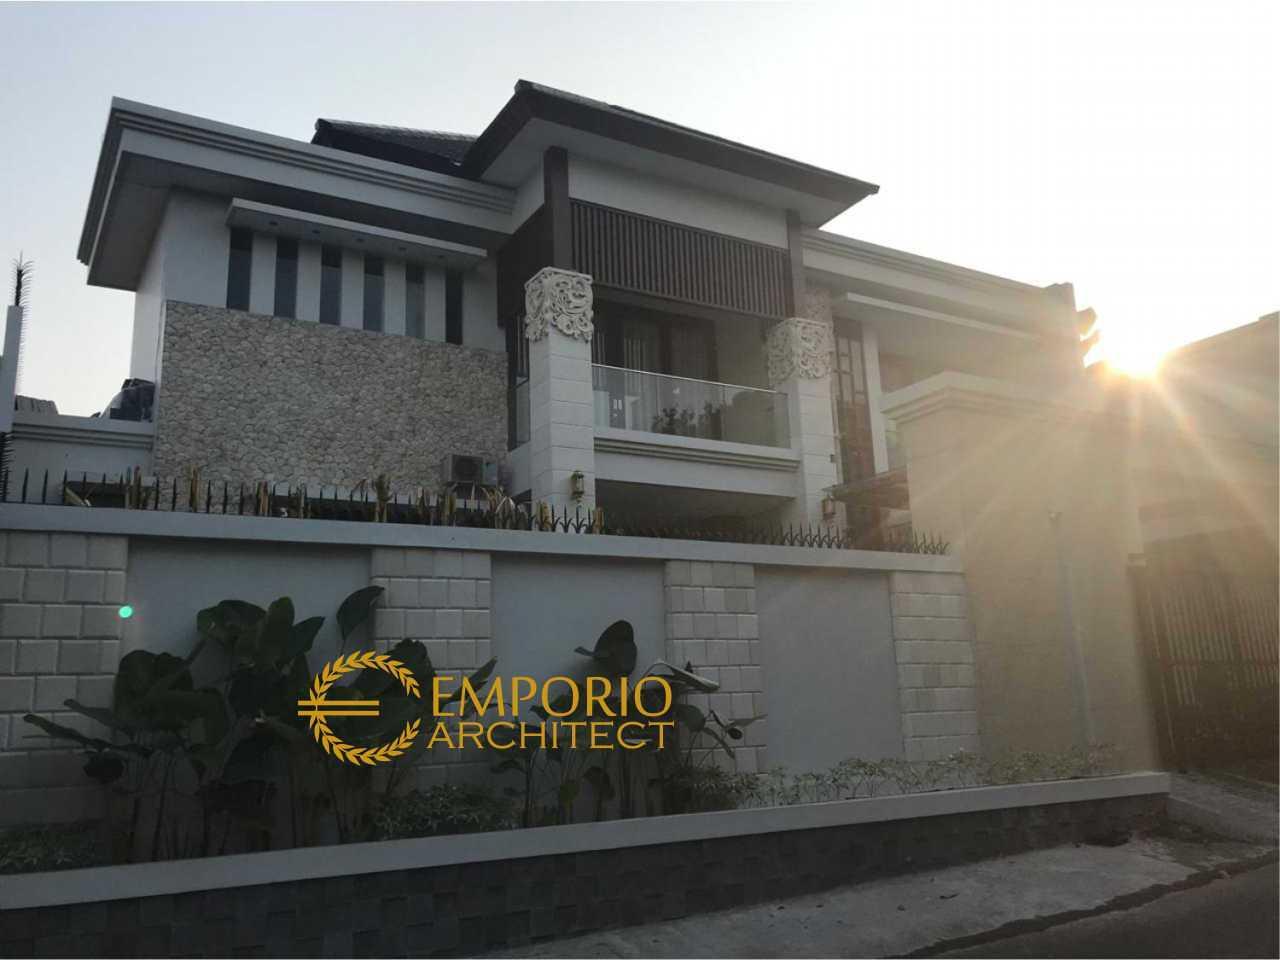 Emporio Architect Jasa Arsitek Bintaro Hasil Konstruksi Rumah Villa Bali Tropis 268 @ Bintaro, Jakarta Selatan Bintaro, Kec. Pesanggrahan, Kota Jakarta Selatan, Daerah Khusus Ibukota Jakarta, Indonesia Bintaro, Kec. Pesanggrahan, Kota Jakarta Selatan, Daerah Khusus Ibukota Jakarta, Indonesia Emporio-Architect-Jasa-Arsitek-Bintaro-Hasil-Konstruksi-Rumah-Villa-Bali-Tropis-268-Bintaro-Jakarta-Selatan  92358